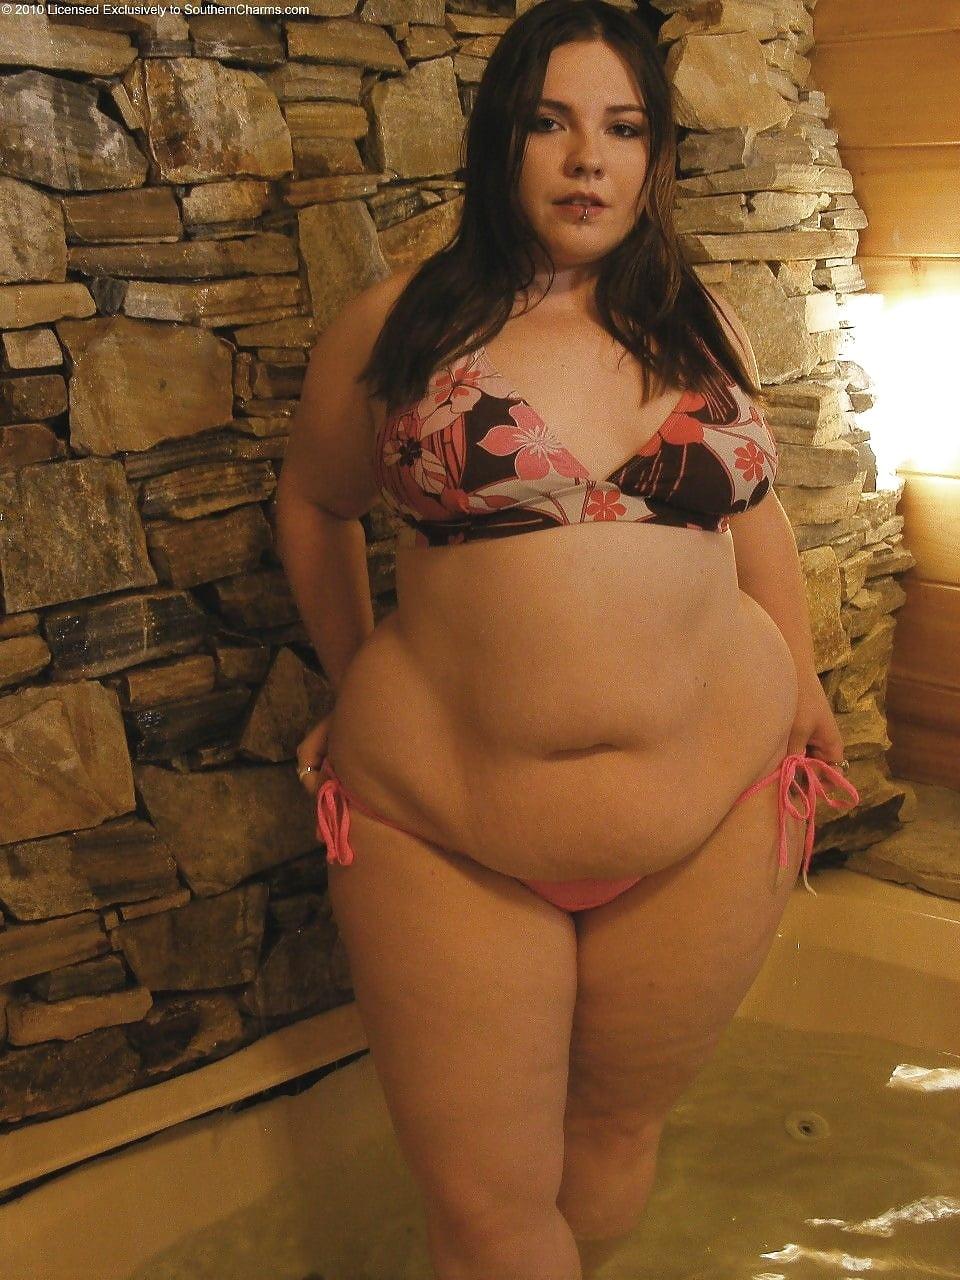 chubby-girl-nude-dad-fucking-jailbait-daughter